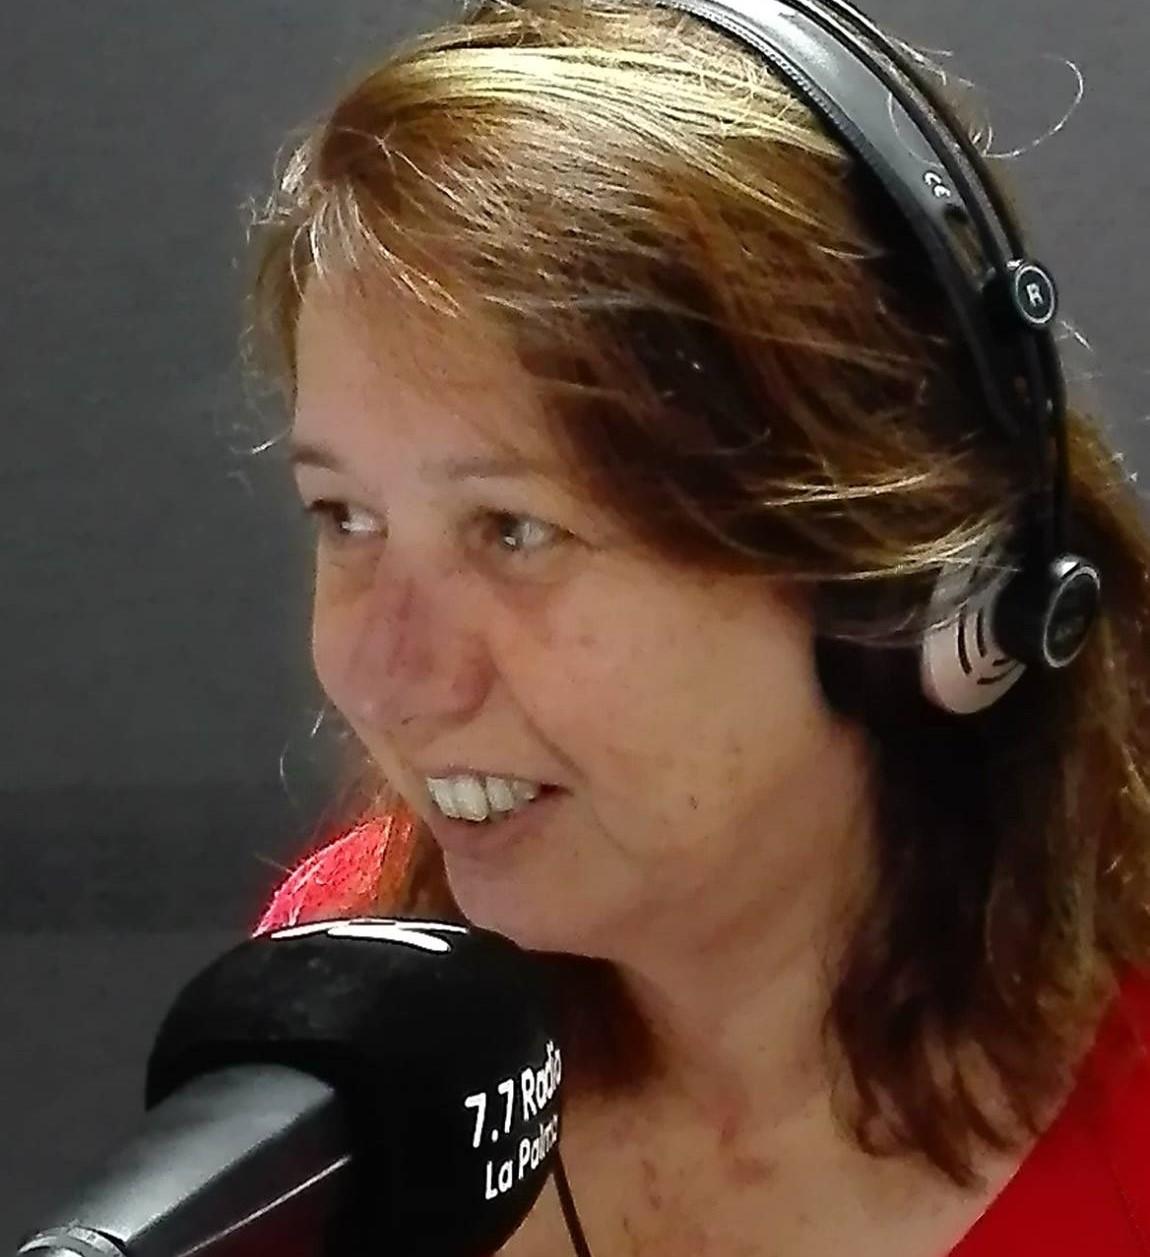 Entrevista Ana Bel Rodríguez – Técnica D.O Queso Palmero   7.7 Radio La Palma